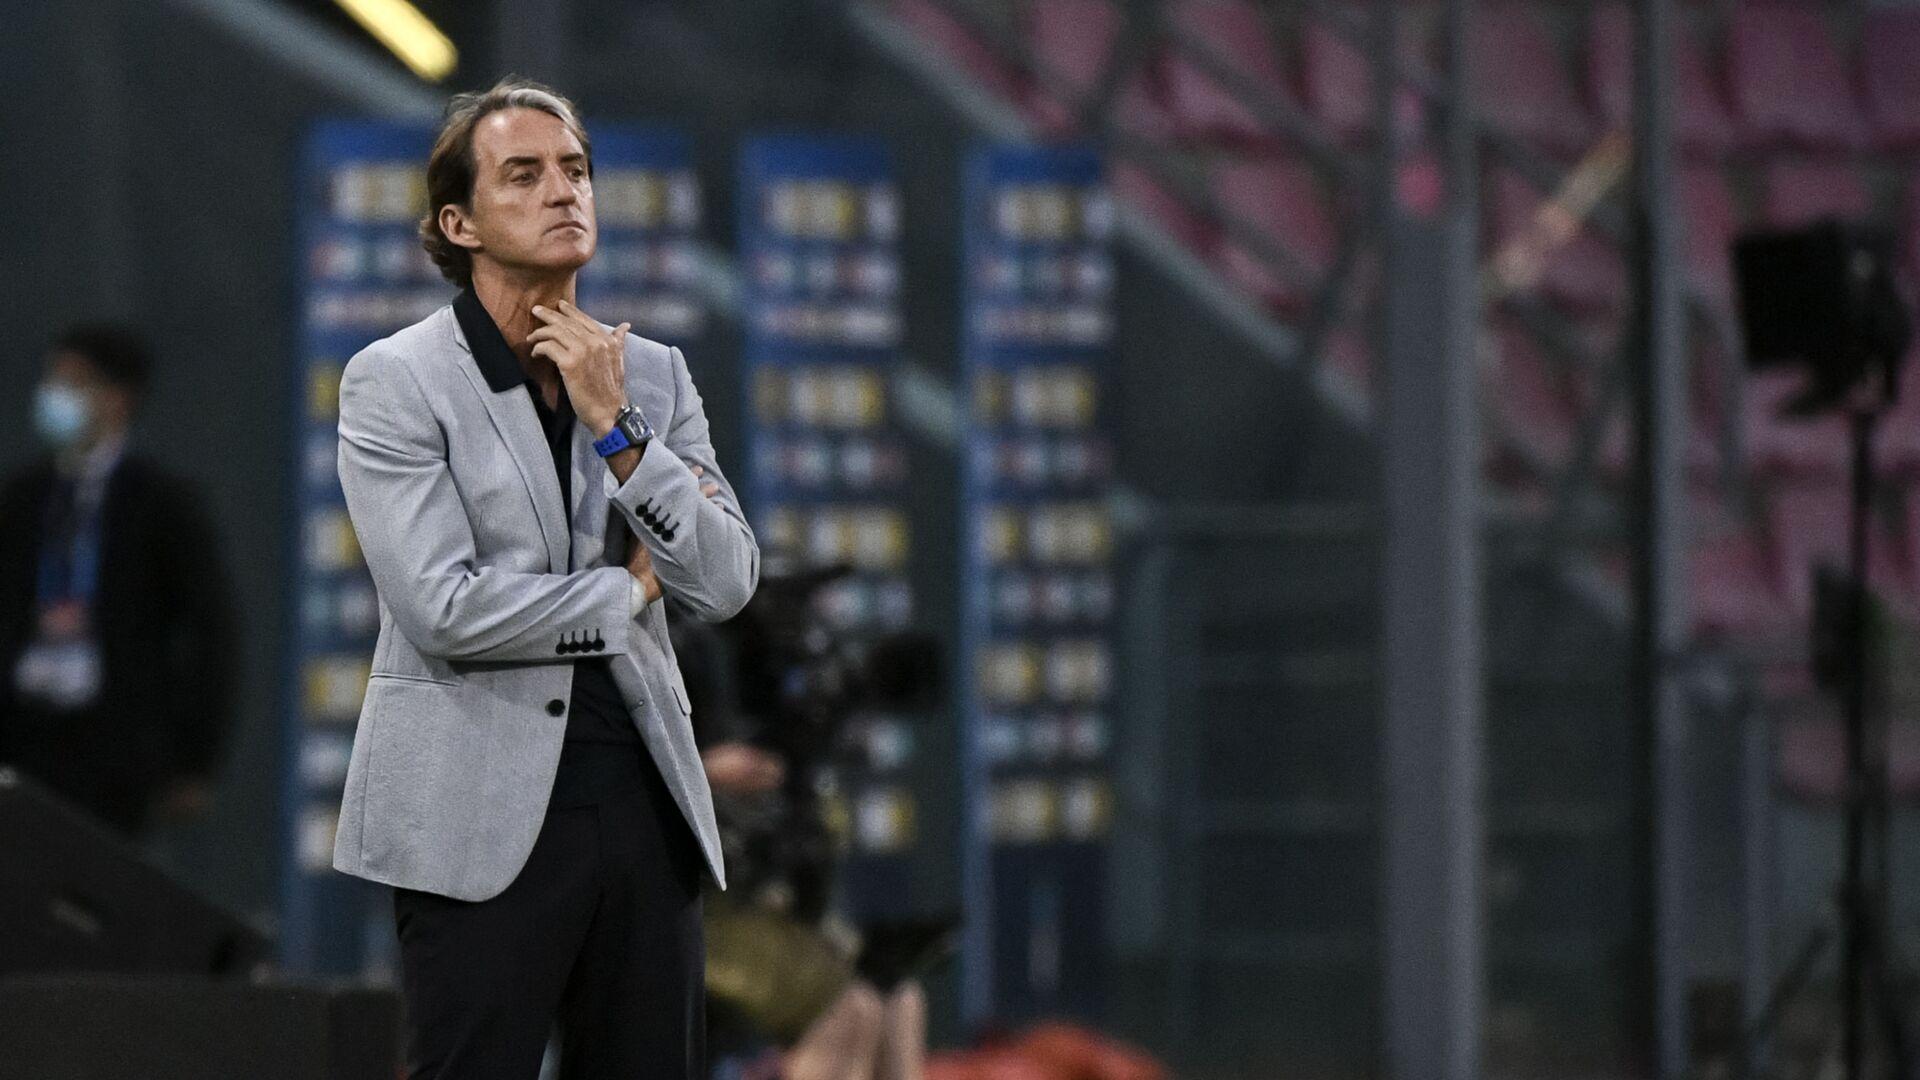 Тренер сборной Италии по футболу Роберто Манчини - Sputnik Italia, 1920, 02.07.2021